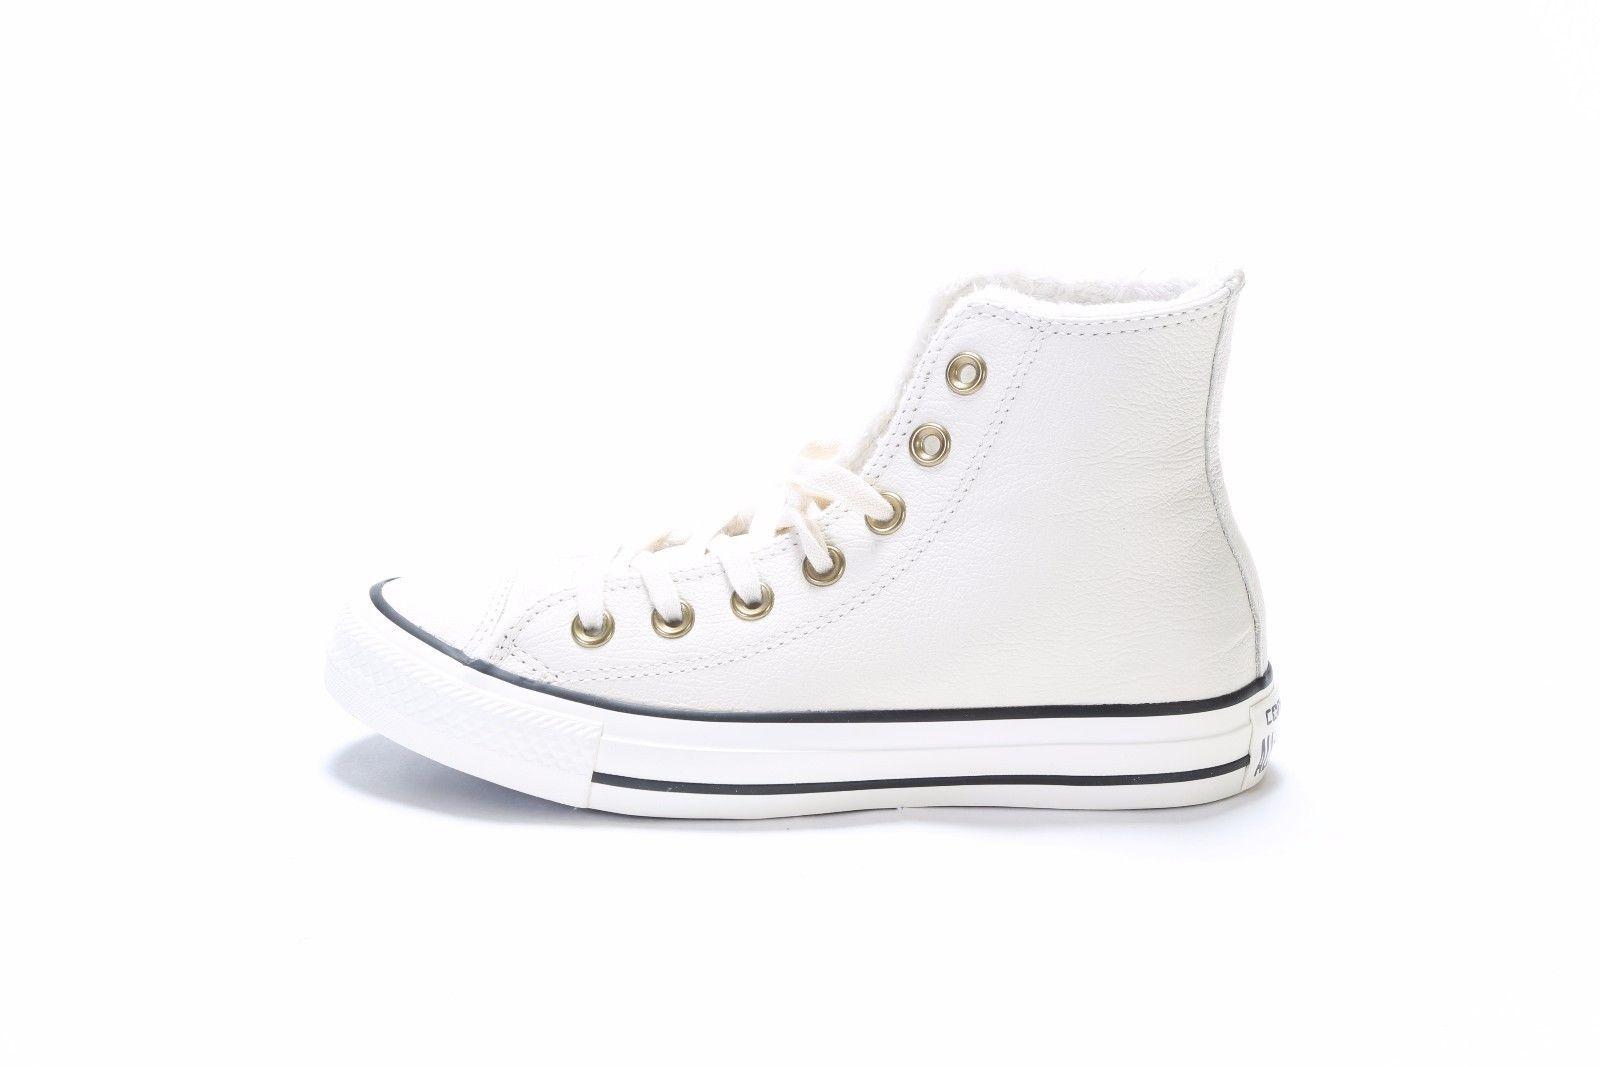 Top shoes converse: Converse Women's Shoes, CTAS Cut Away